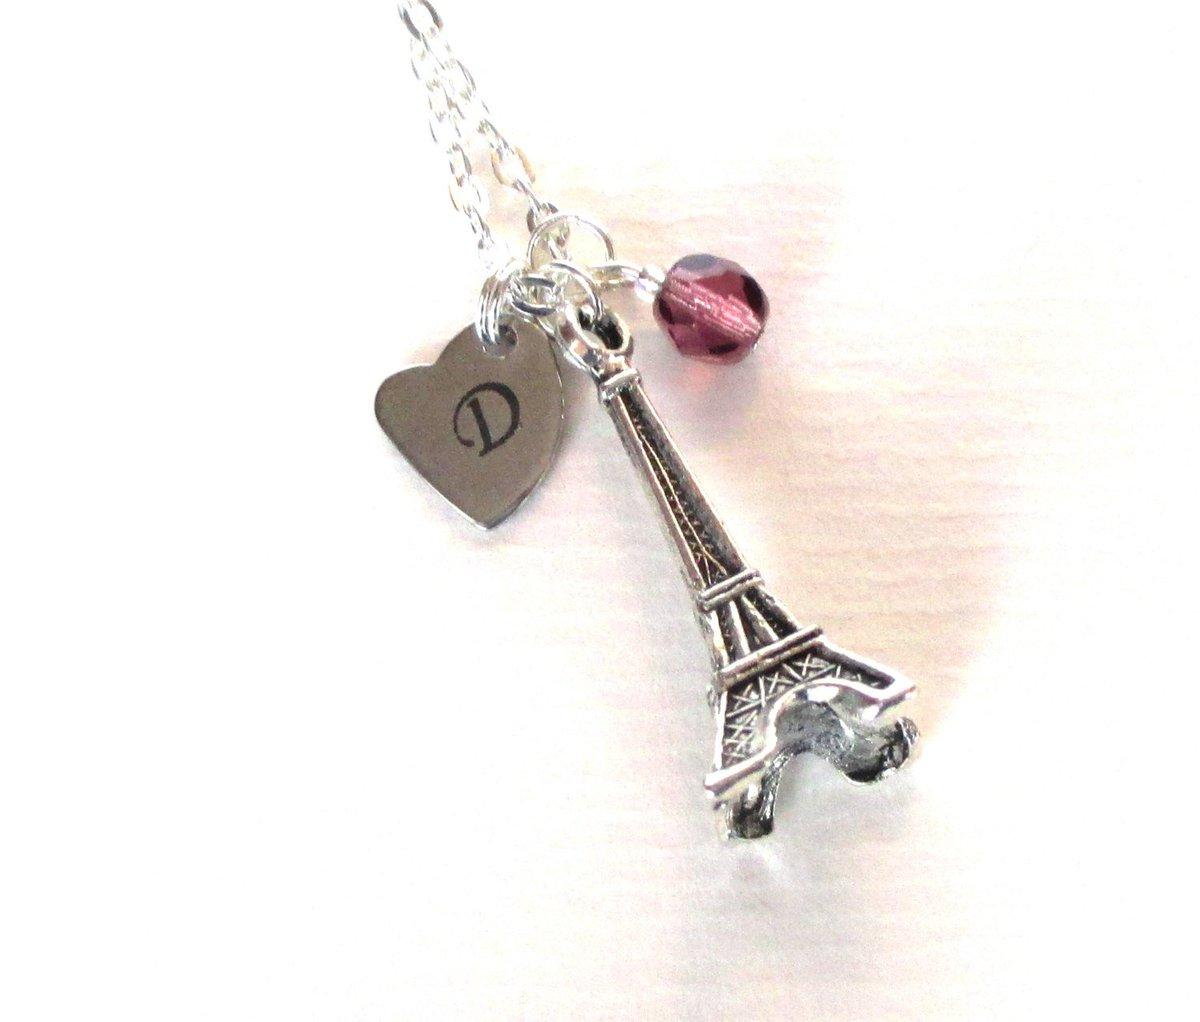 Mother&#39;s Day gift - Eiffel Tower necklace -  Mum gift - Paris gift - Initial …  http:// tuppu.net/56ba0a7d  &nbsp;   #Etsy #EtsyUk<br>http://pic.twitter.com/rvnEms4Okg